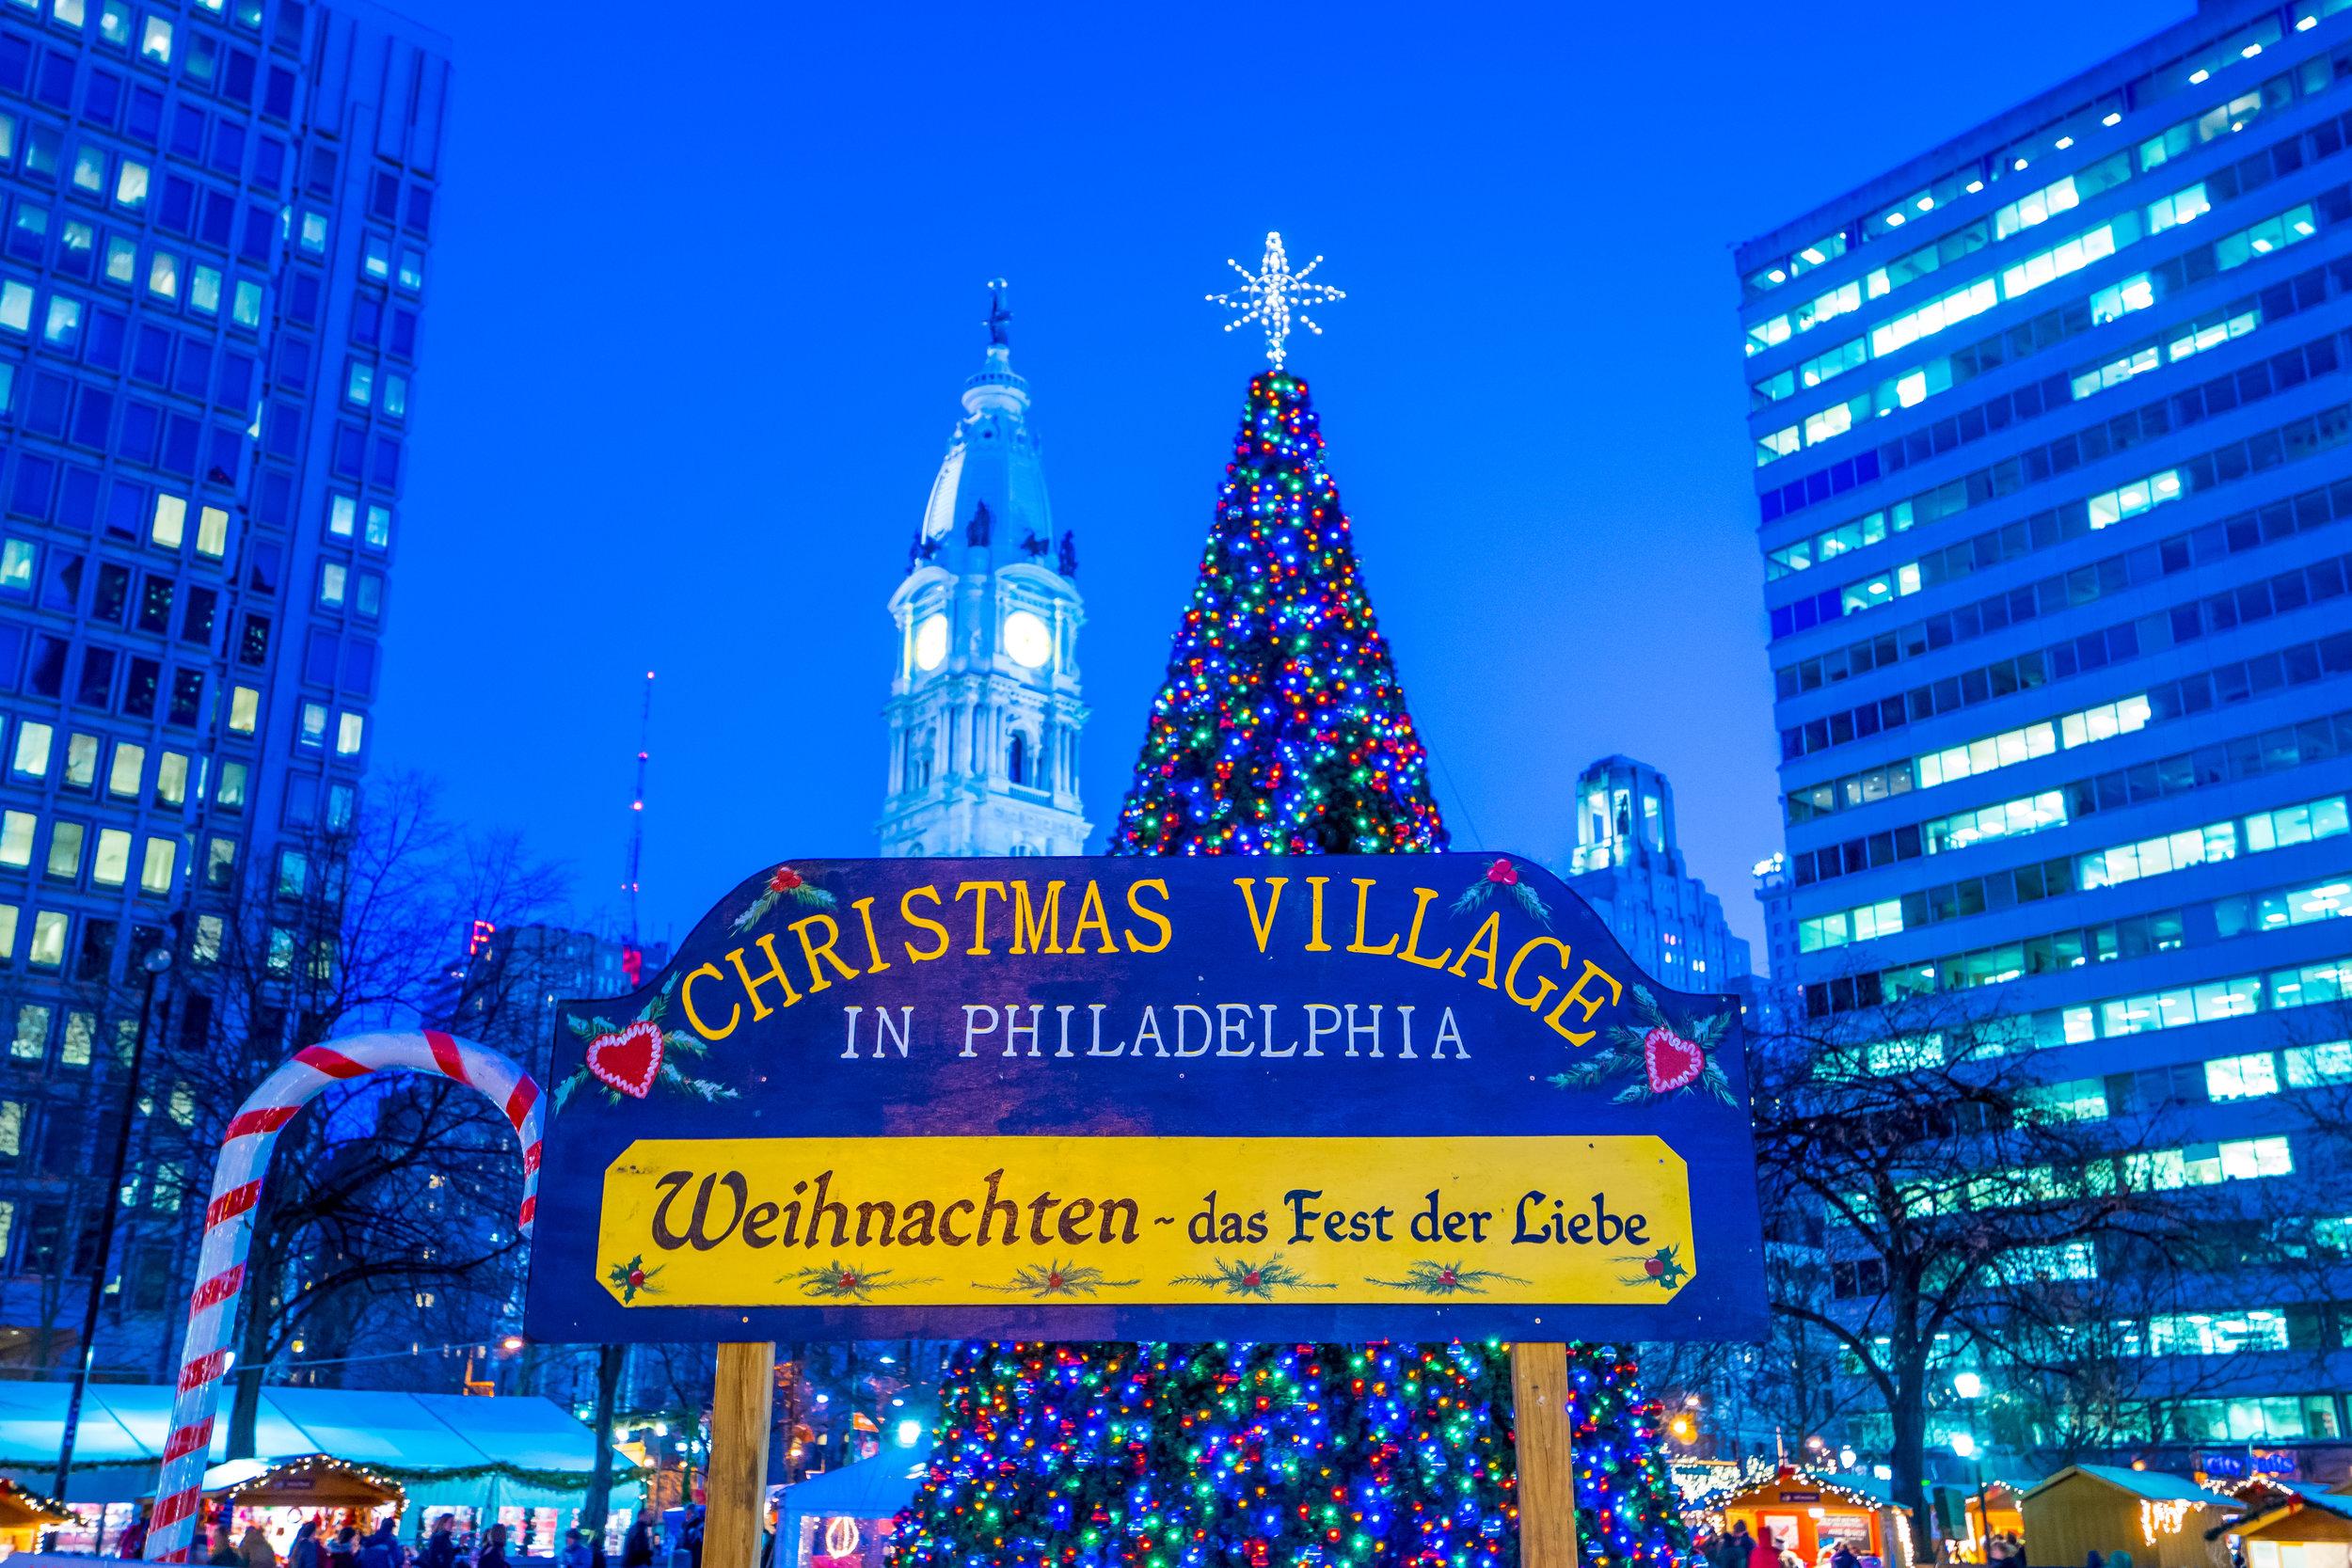 Christmas Village Philadelphia, Christmas Village, German Christmas Market